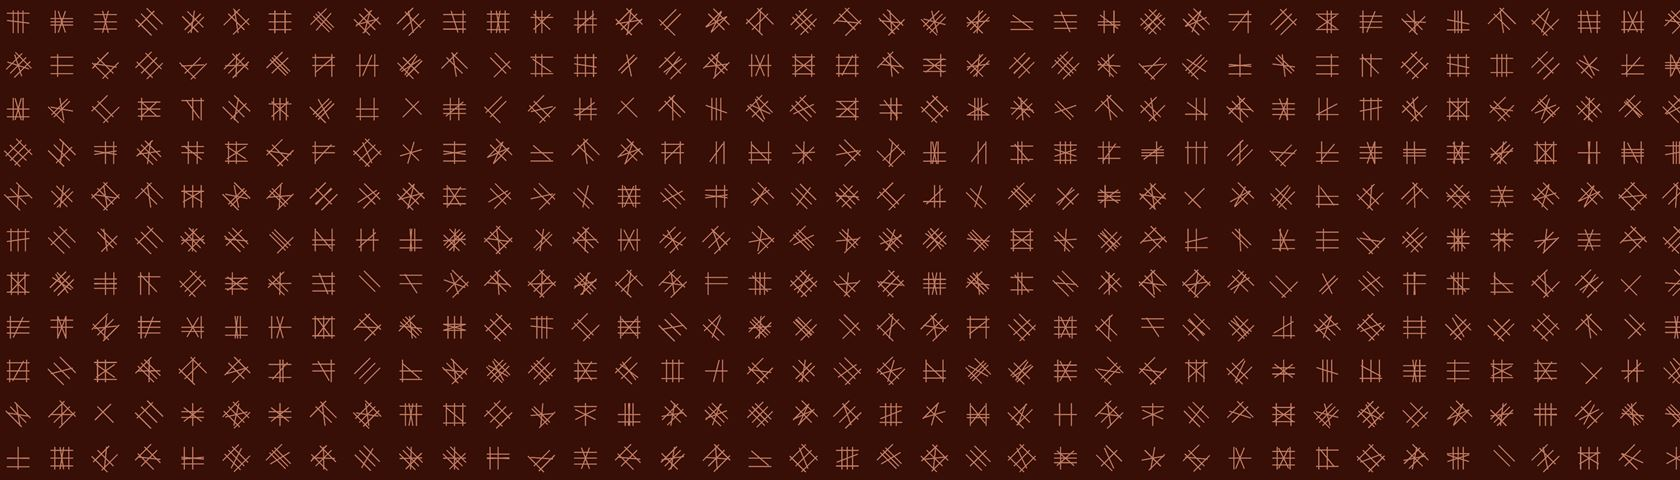 Semiks Alphabet